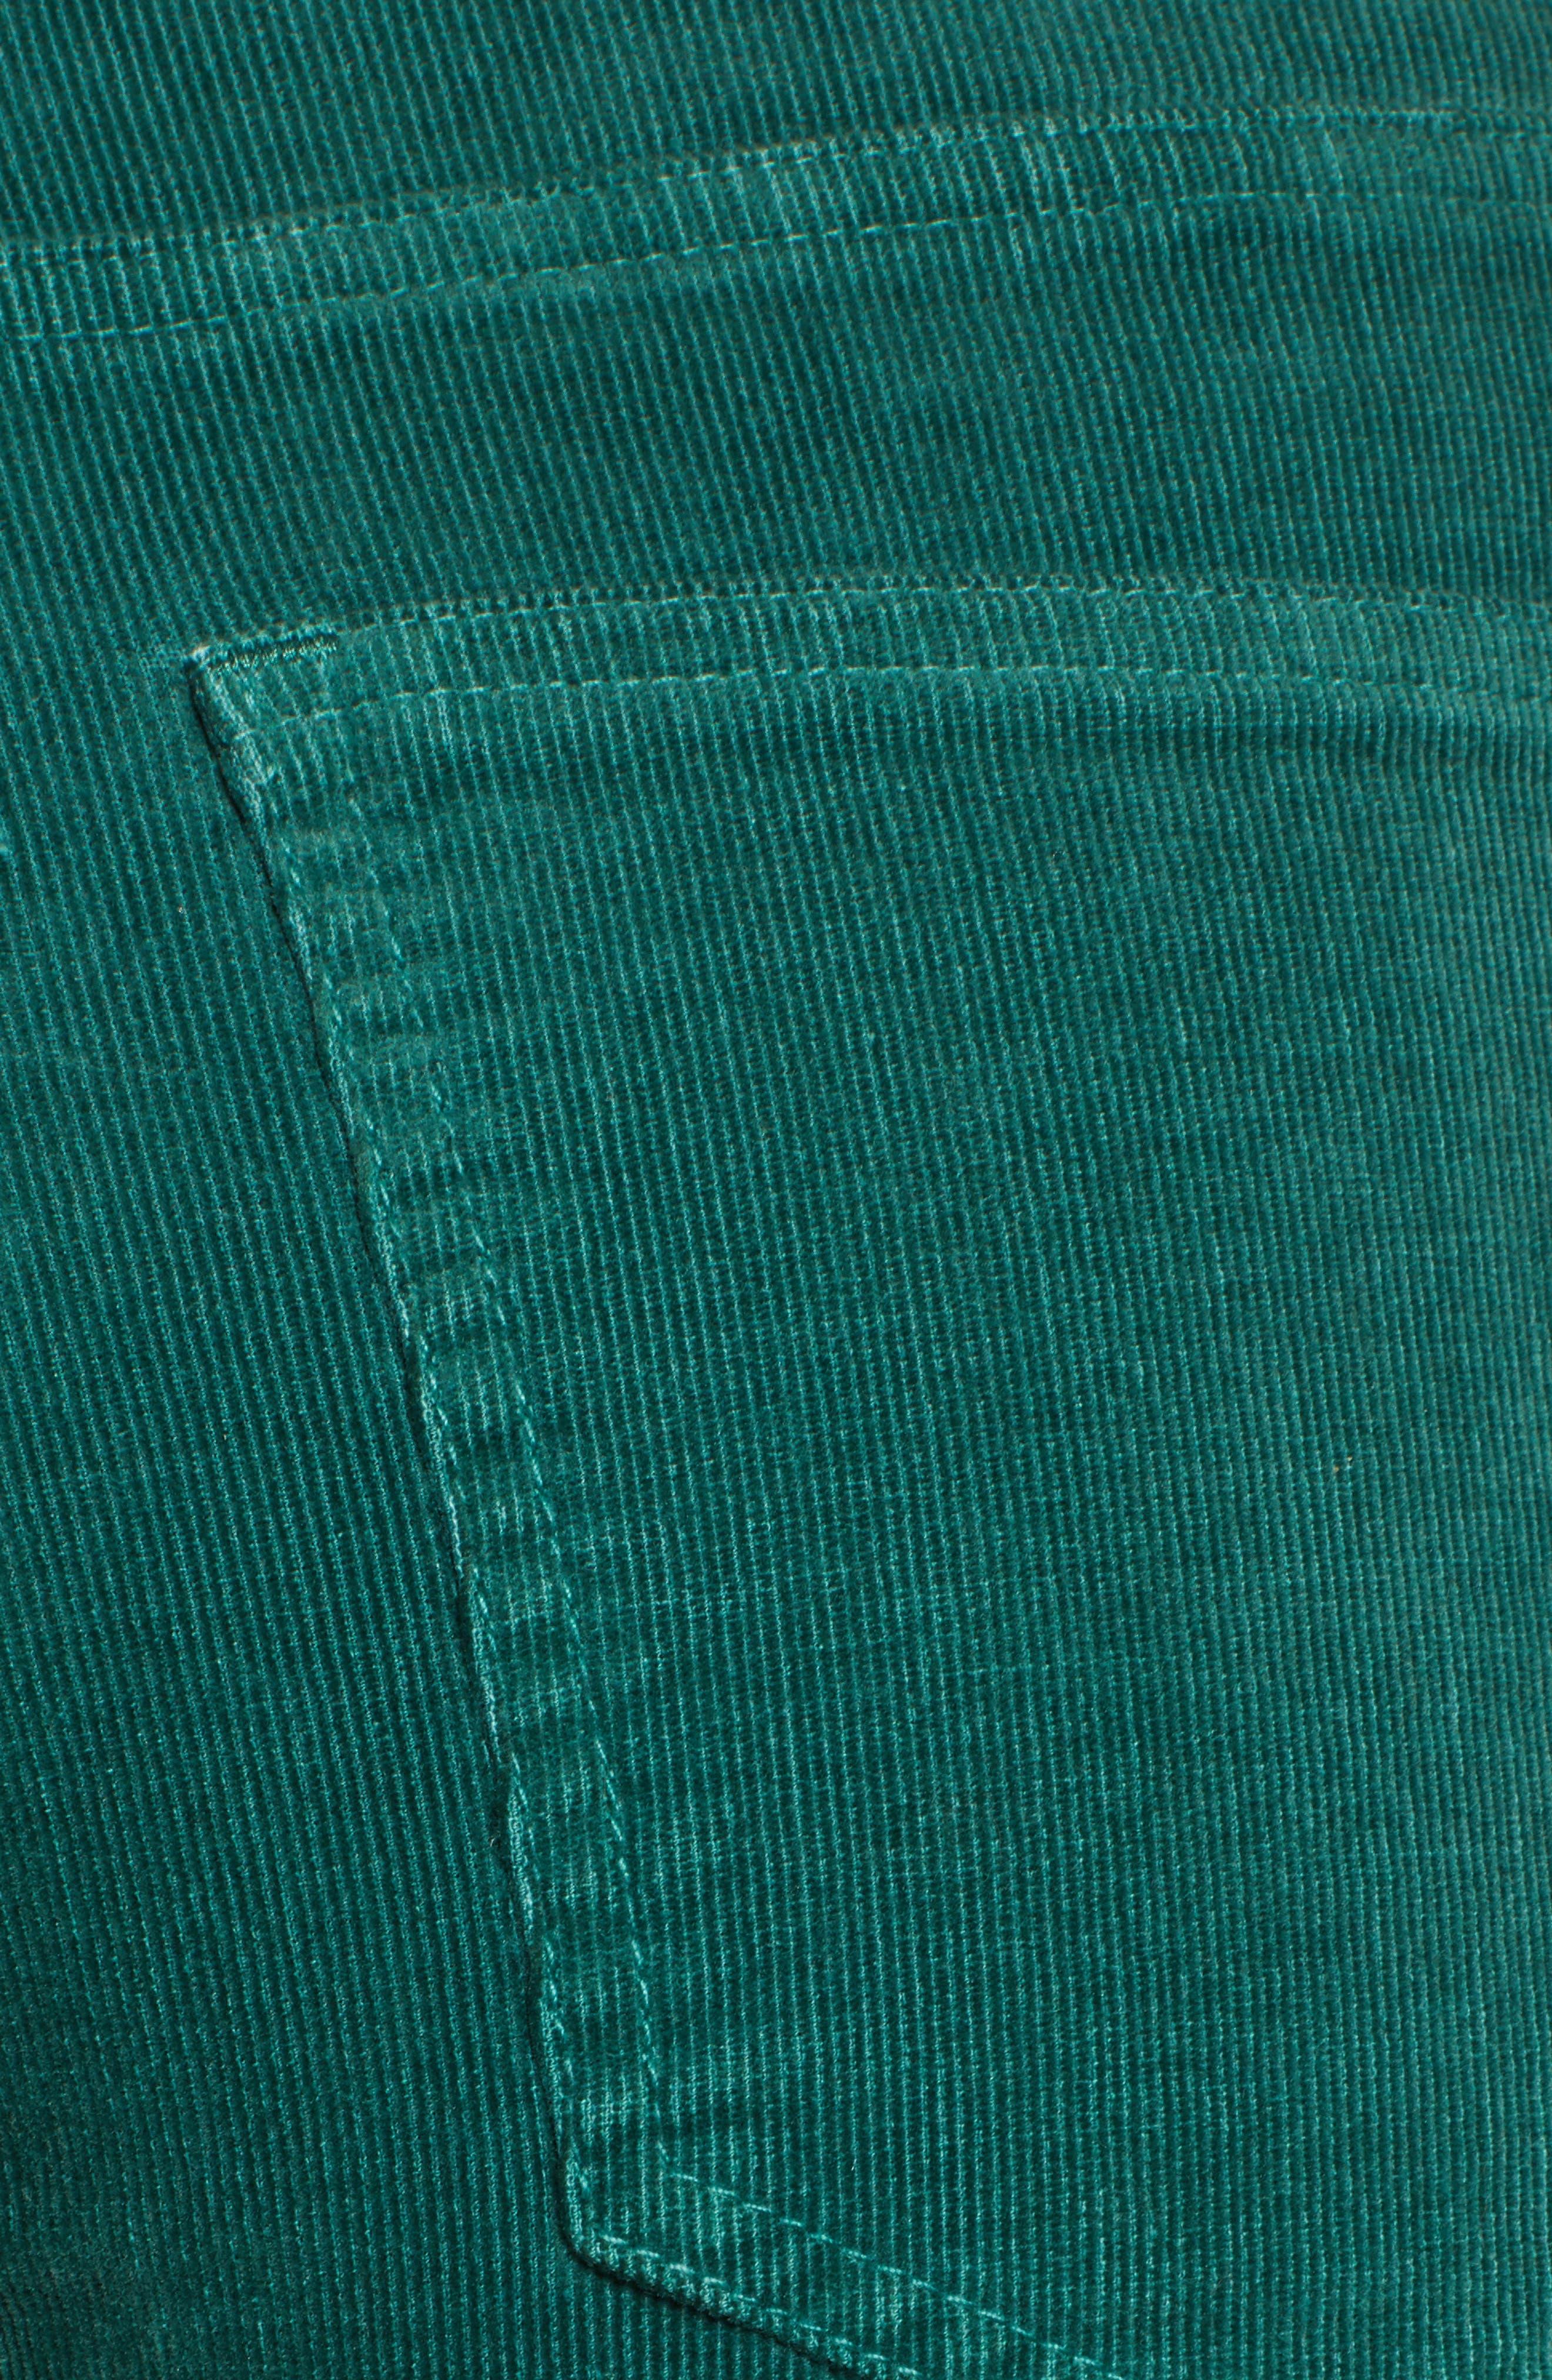 Crop Flare Pants,                             Alternate thumbnail 6, color,                             EMERALD